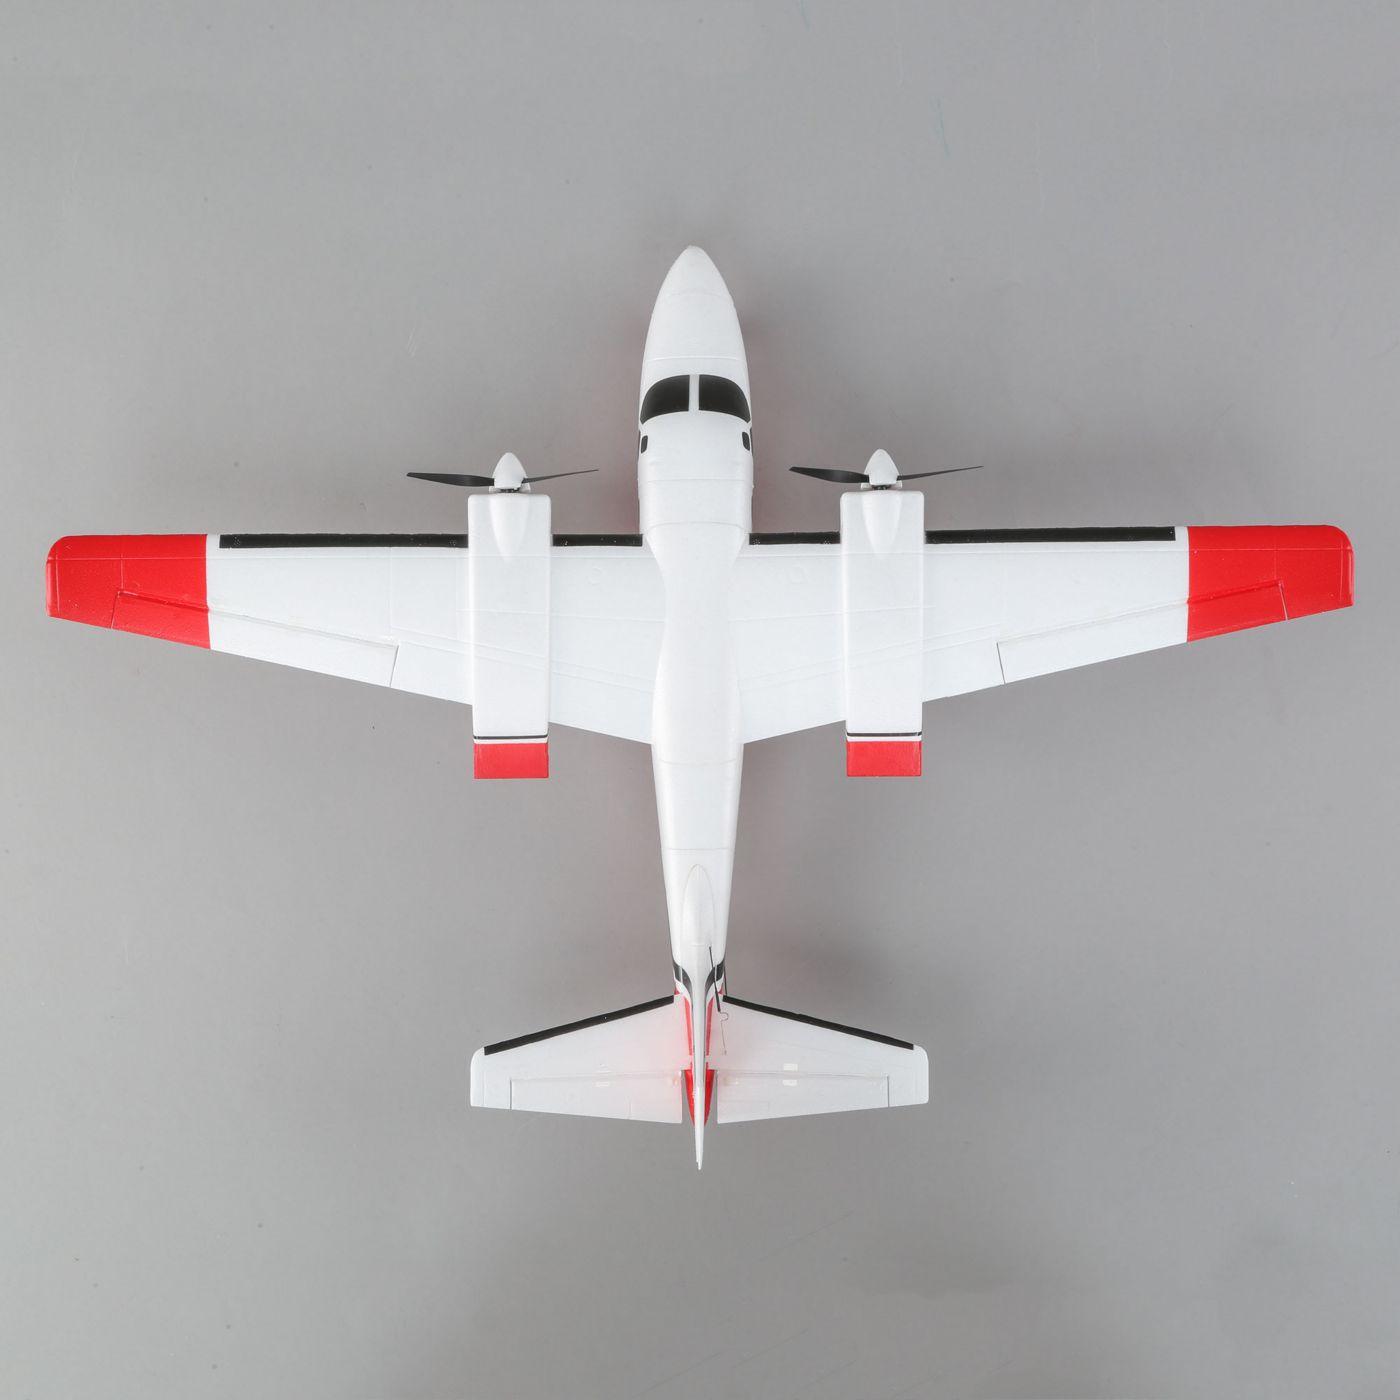 E-flite Aero Commander BNF Basic AS3X SAFE 03